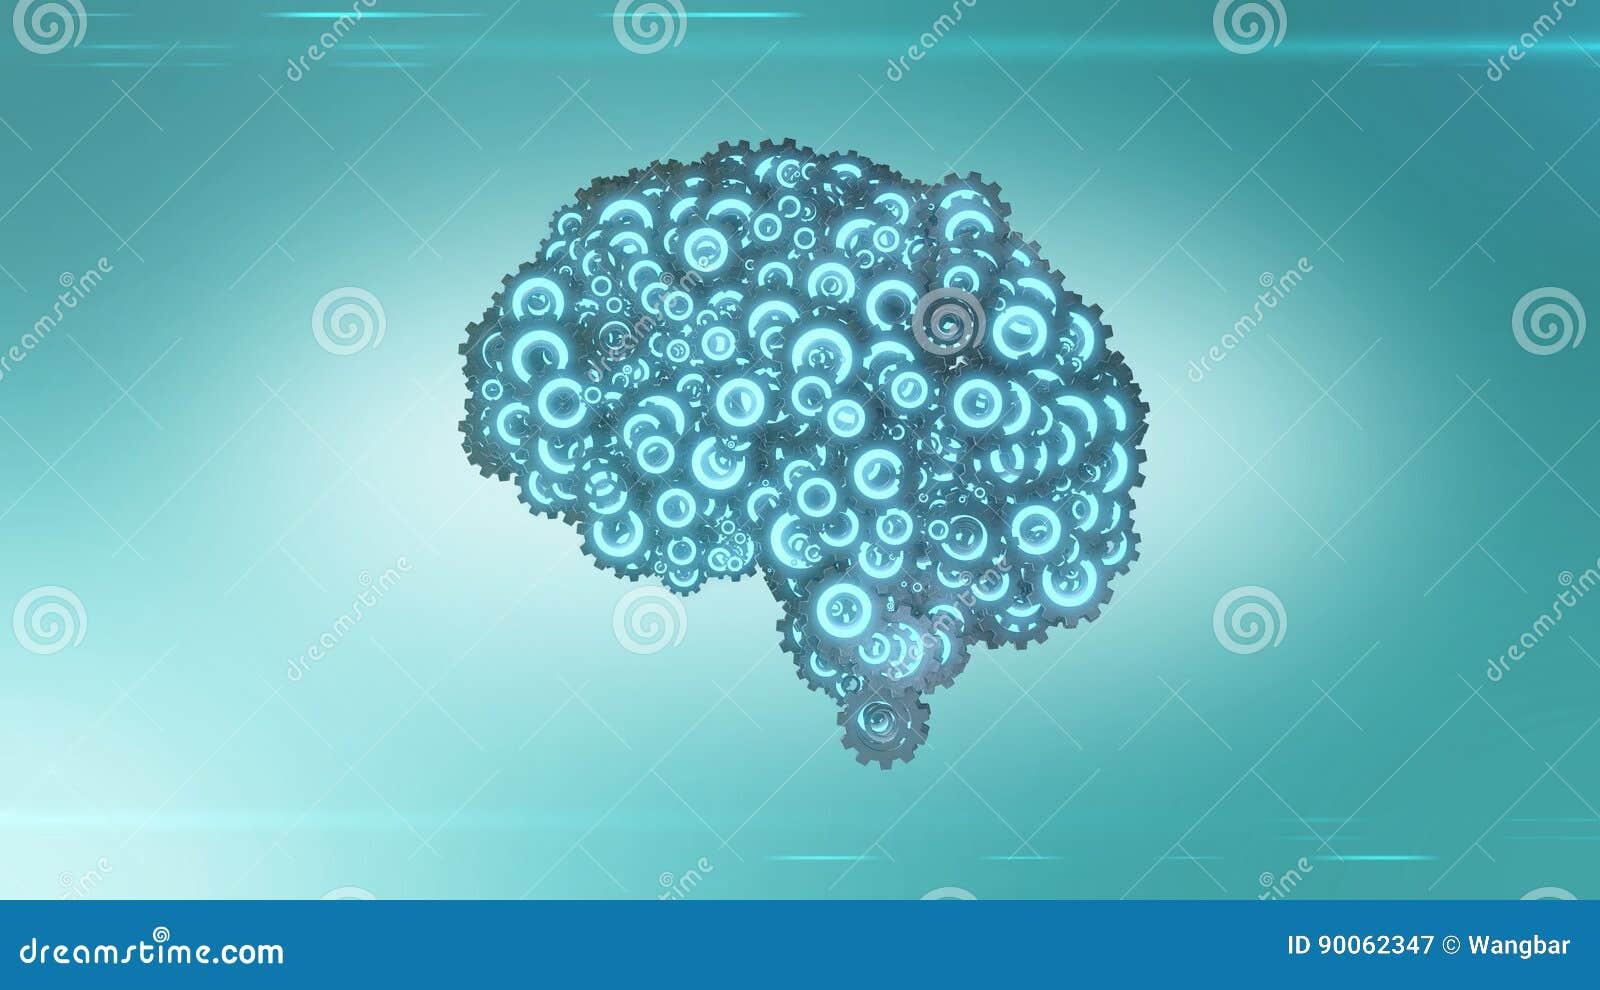 Futuristic brain steampunk concept